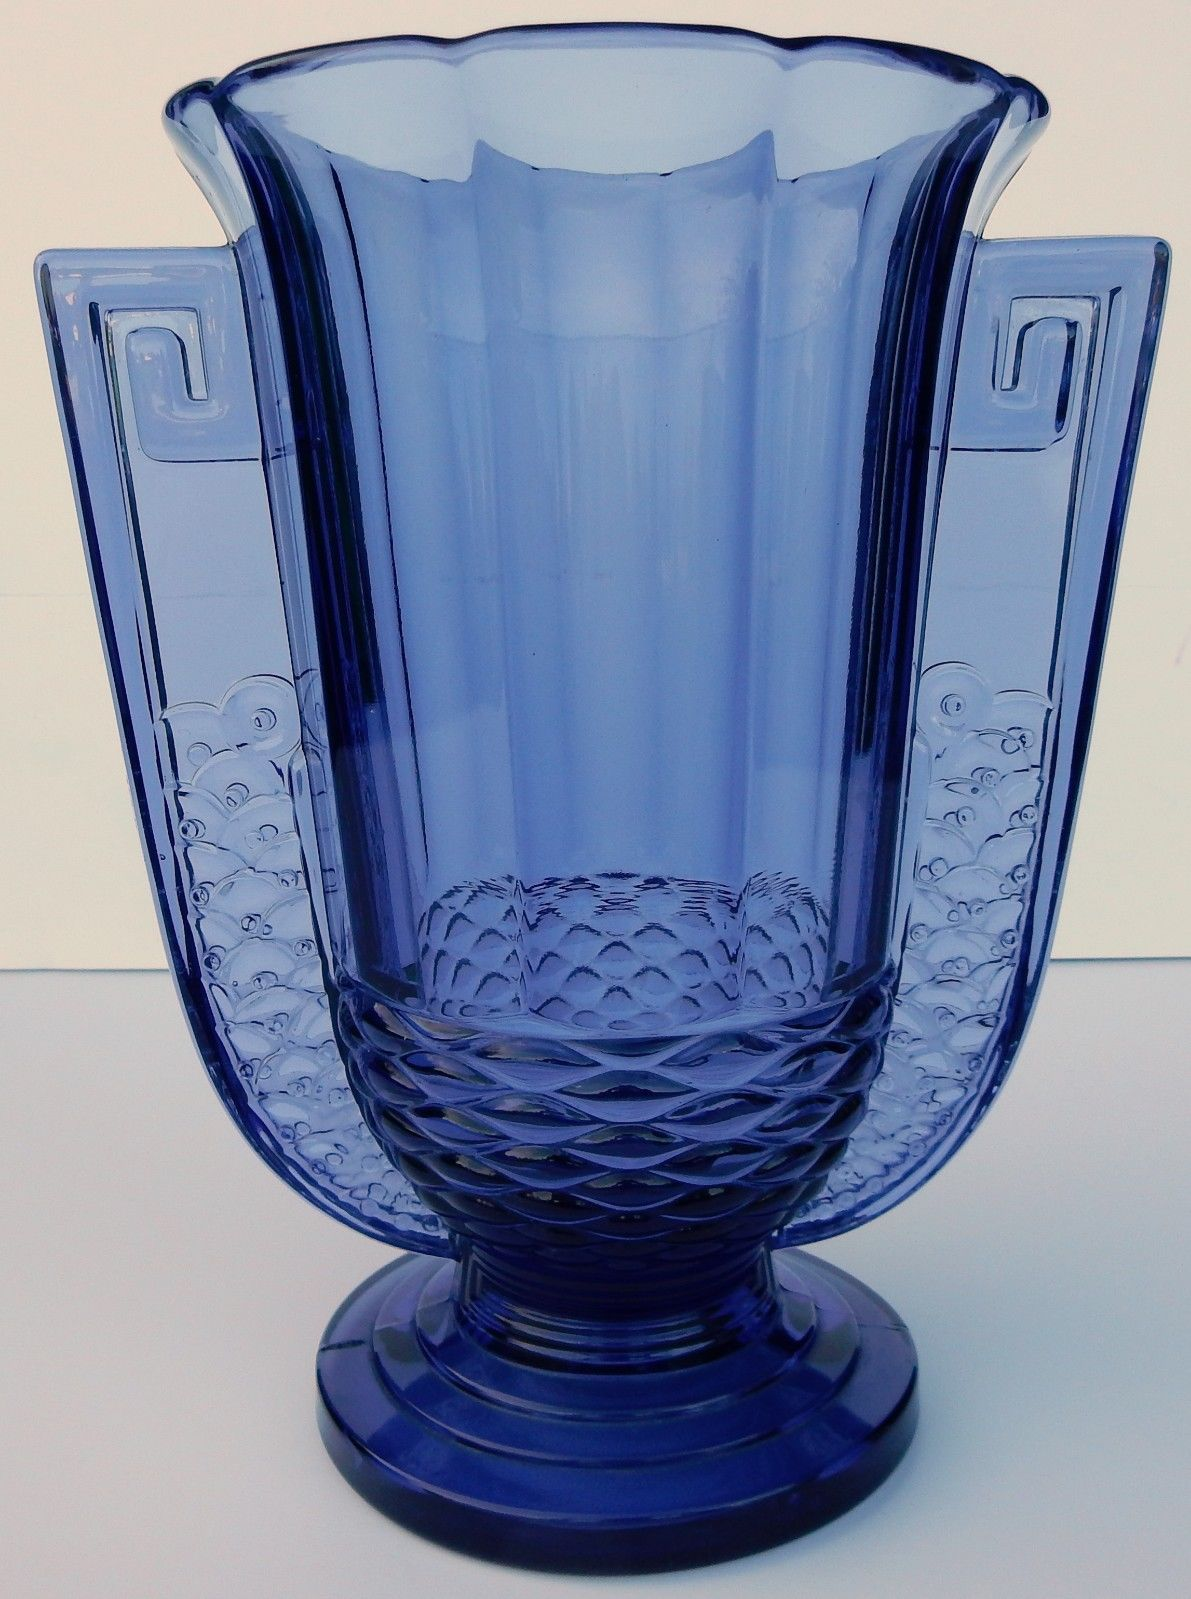 Stunning art deco val saint st lambert glass vase romeo luxval stunning art deco val saint st lambert glass vase romeo luxval belgium c 1930 picclick reviewsmspy